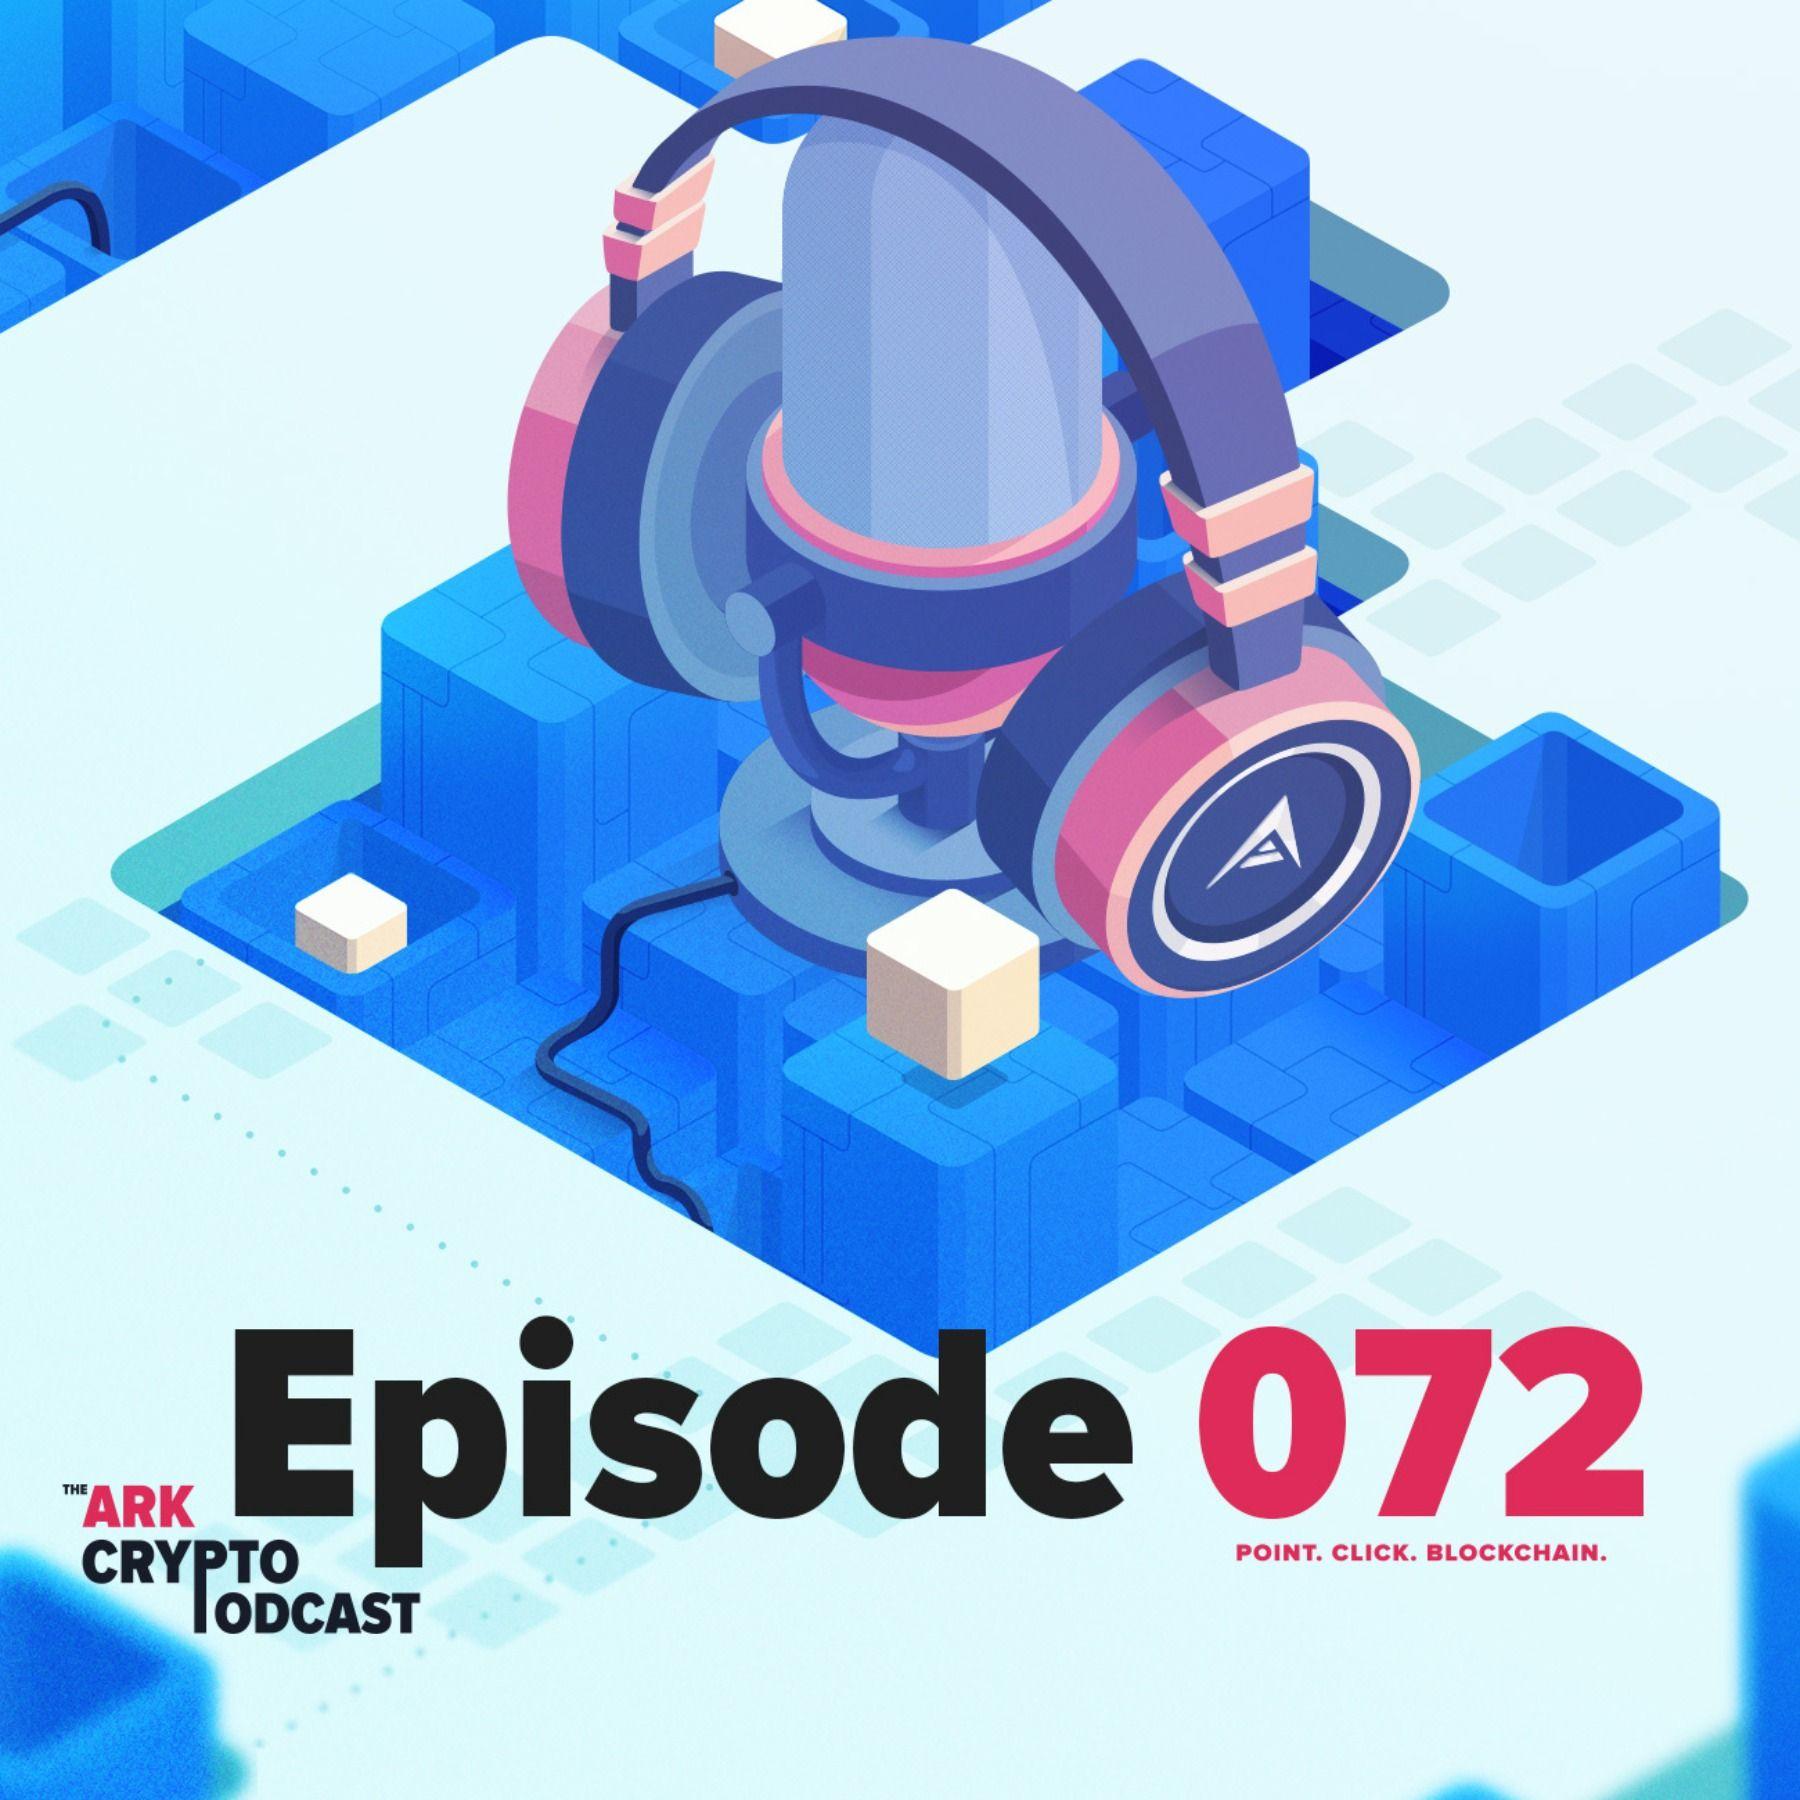 ARK Crypto Podcast #072 - ARK Core Values Deep Dive, Scalability